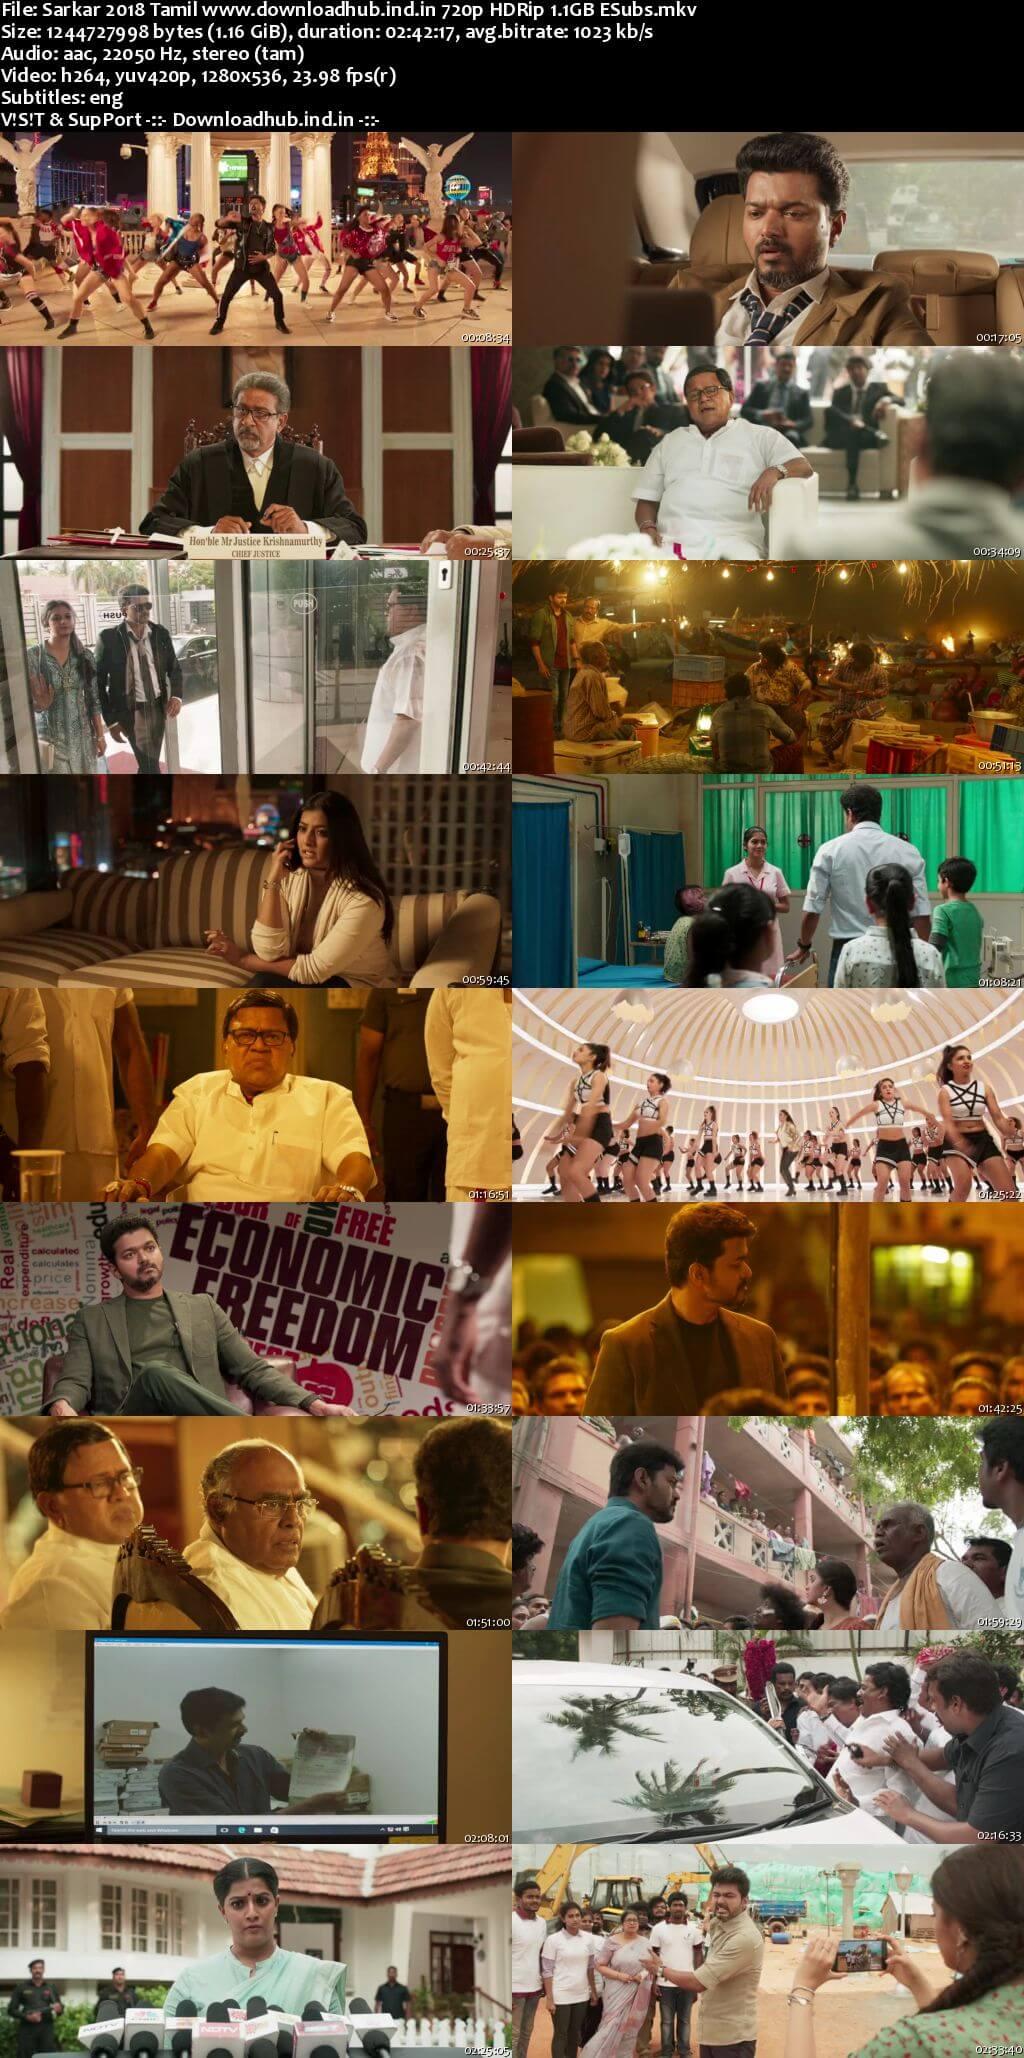 Sarkar 2018 Tamil 720p HDRip ESubs